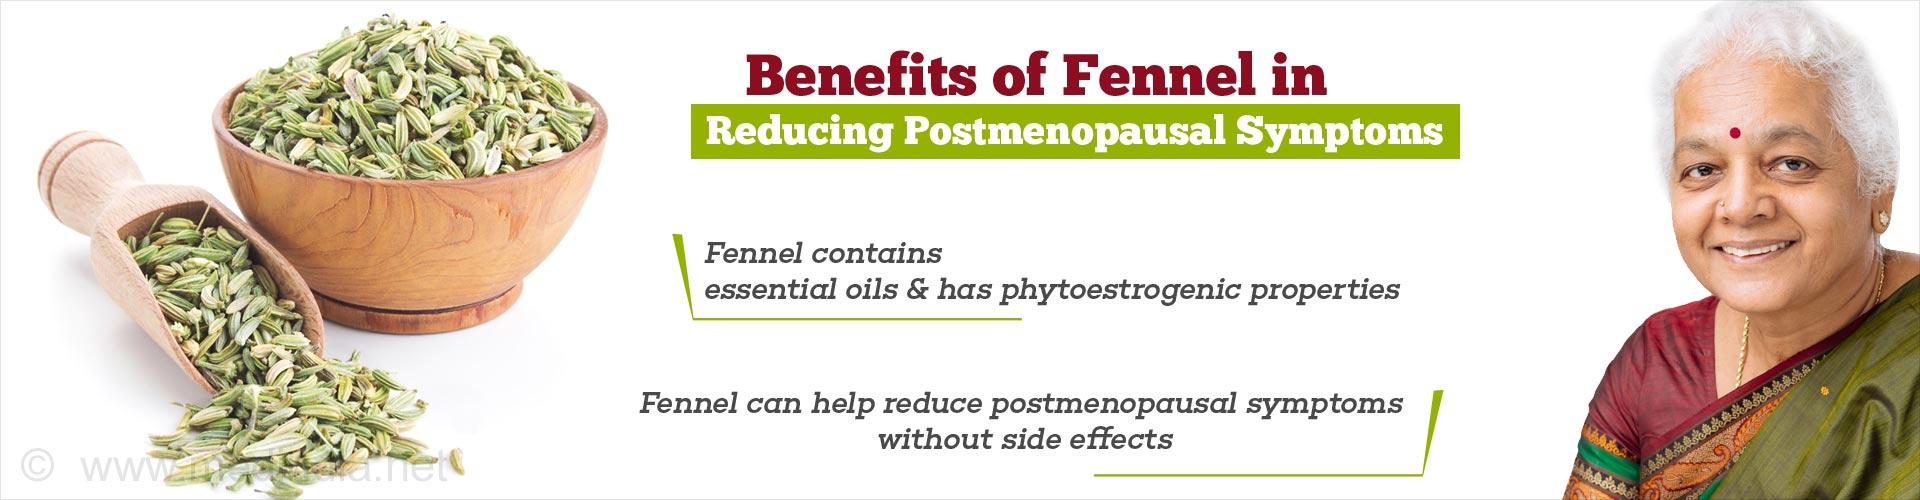 Fennel can Help Reduce Post-Menopausal Symptoms